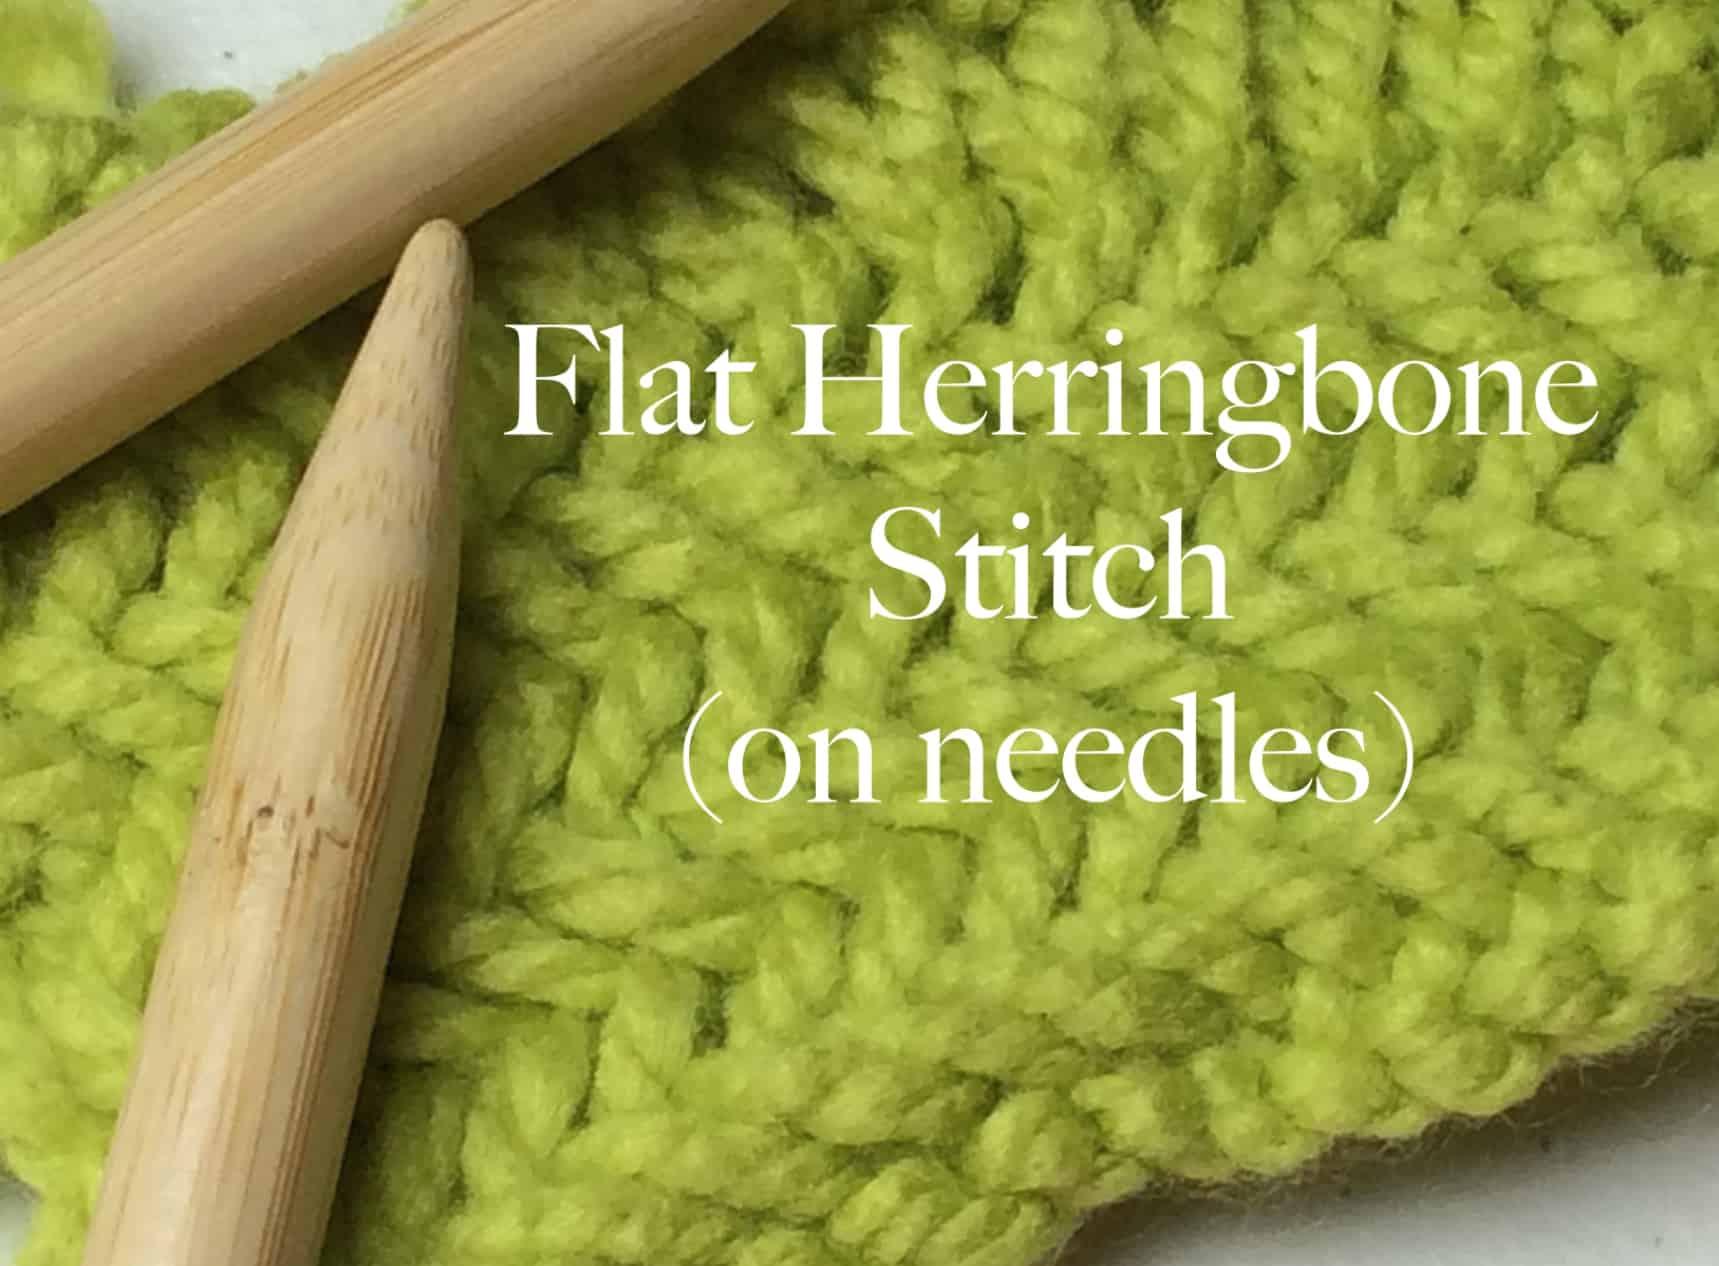 Flat Herringbone Stitch (needles) - GoodKnit Kisses